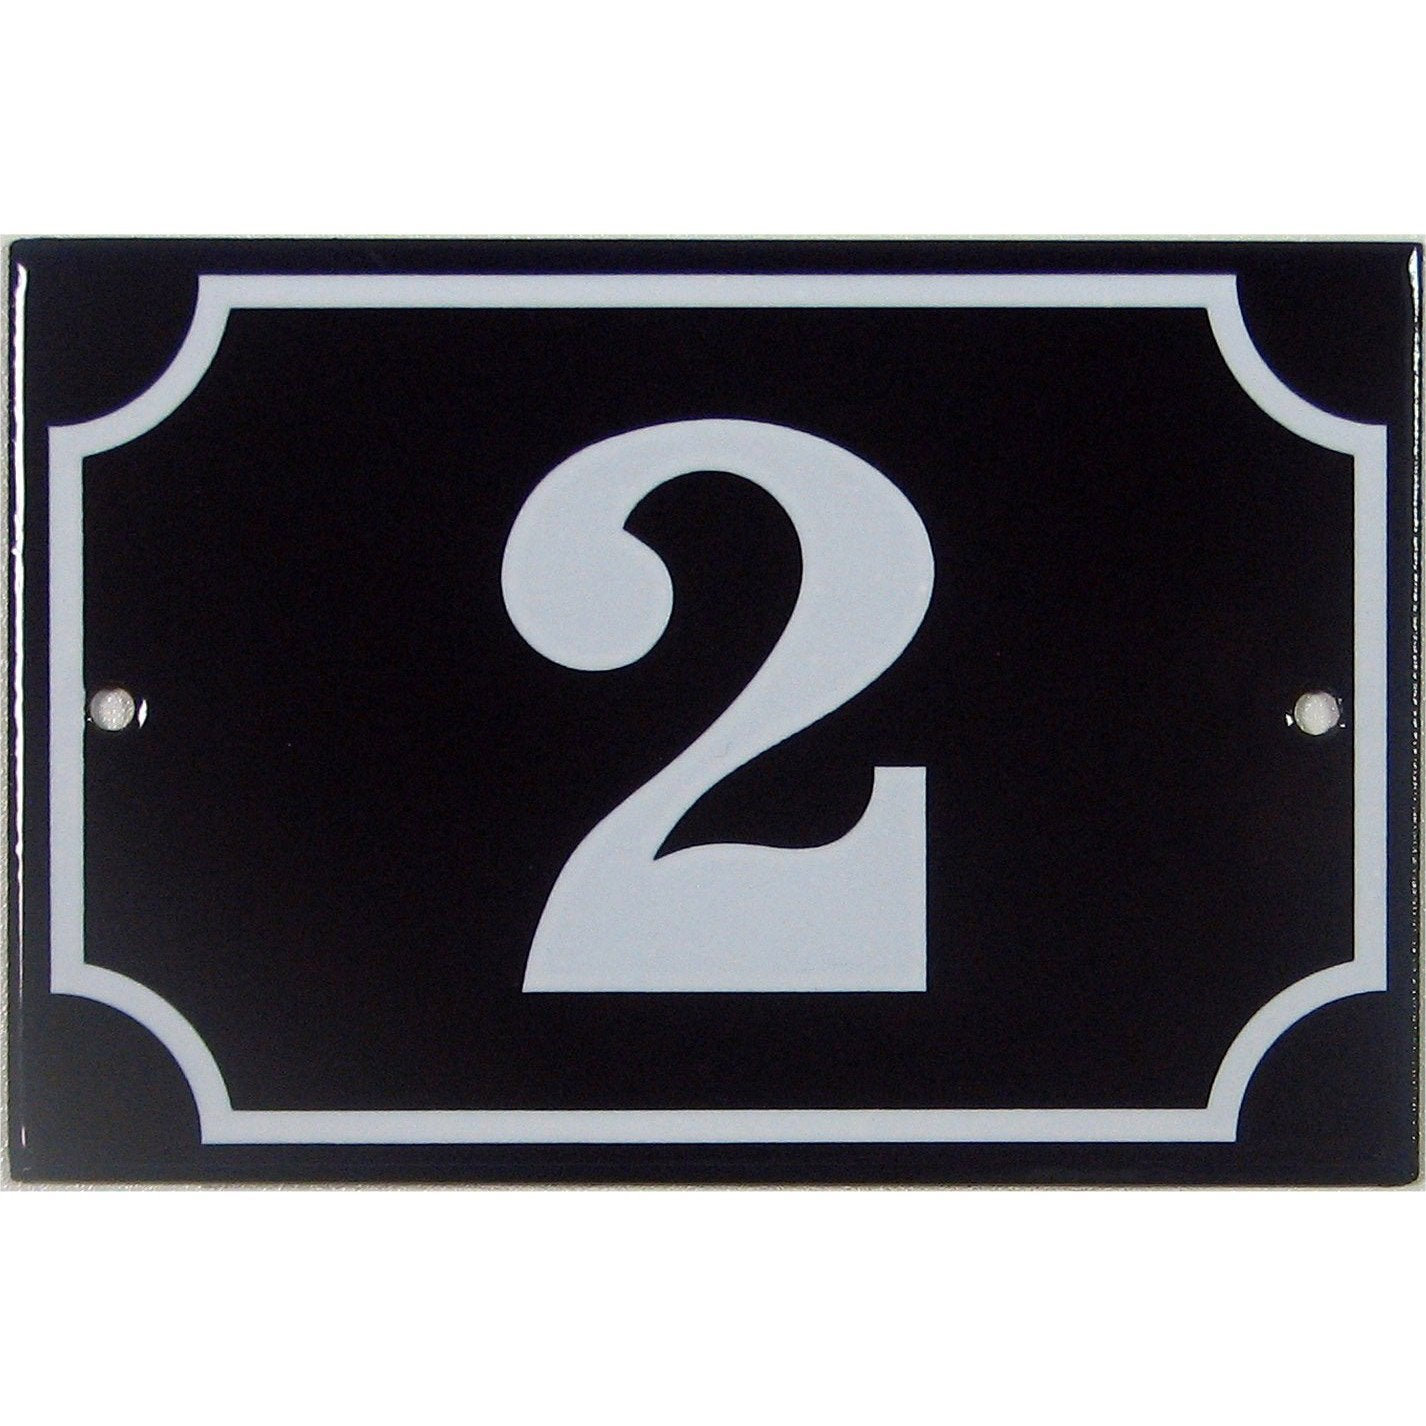 plaque 2 en acier leroy merlin. Black Bedroom Furniture Sets. Home Design Ideas